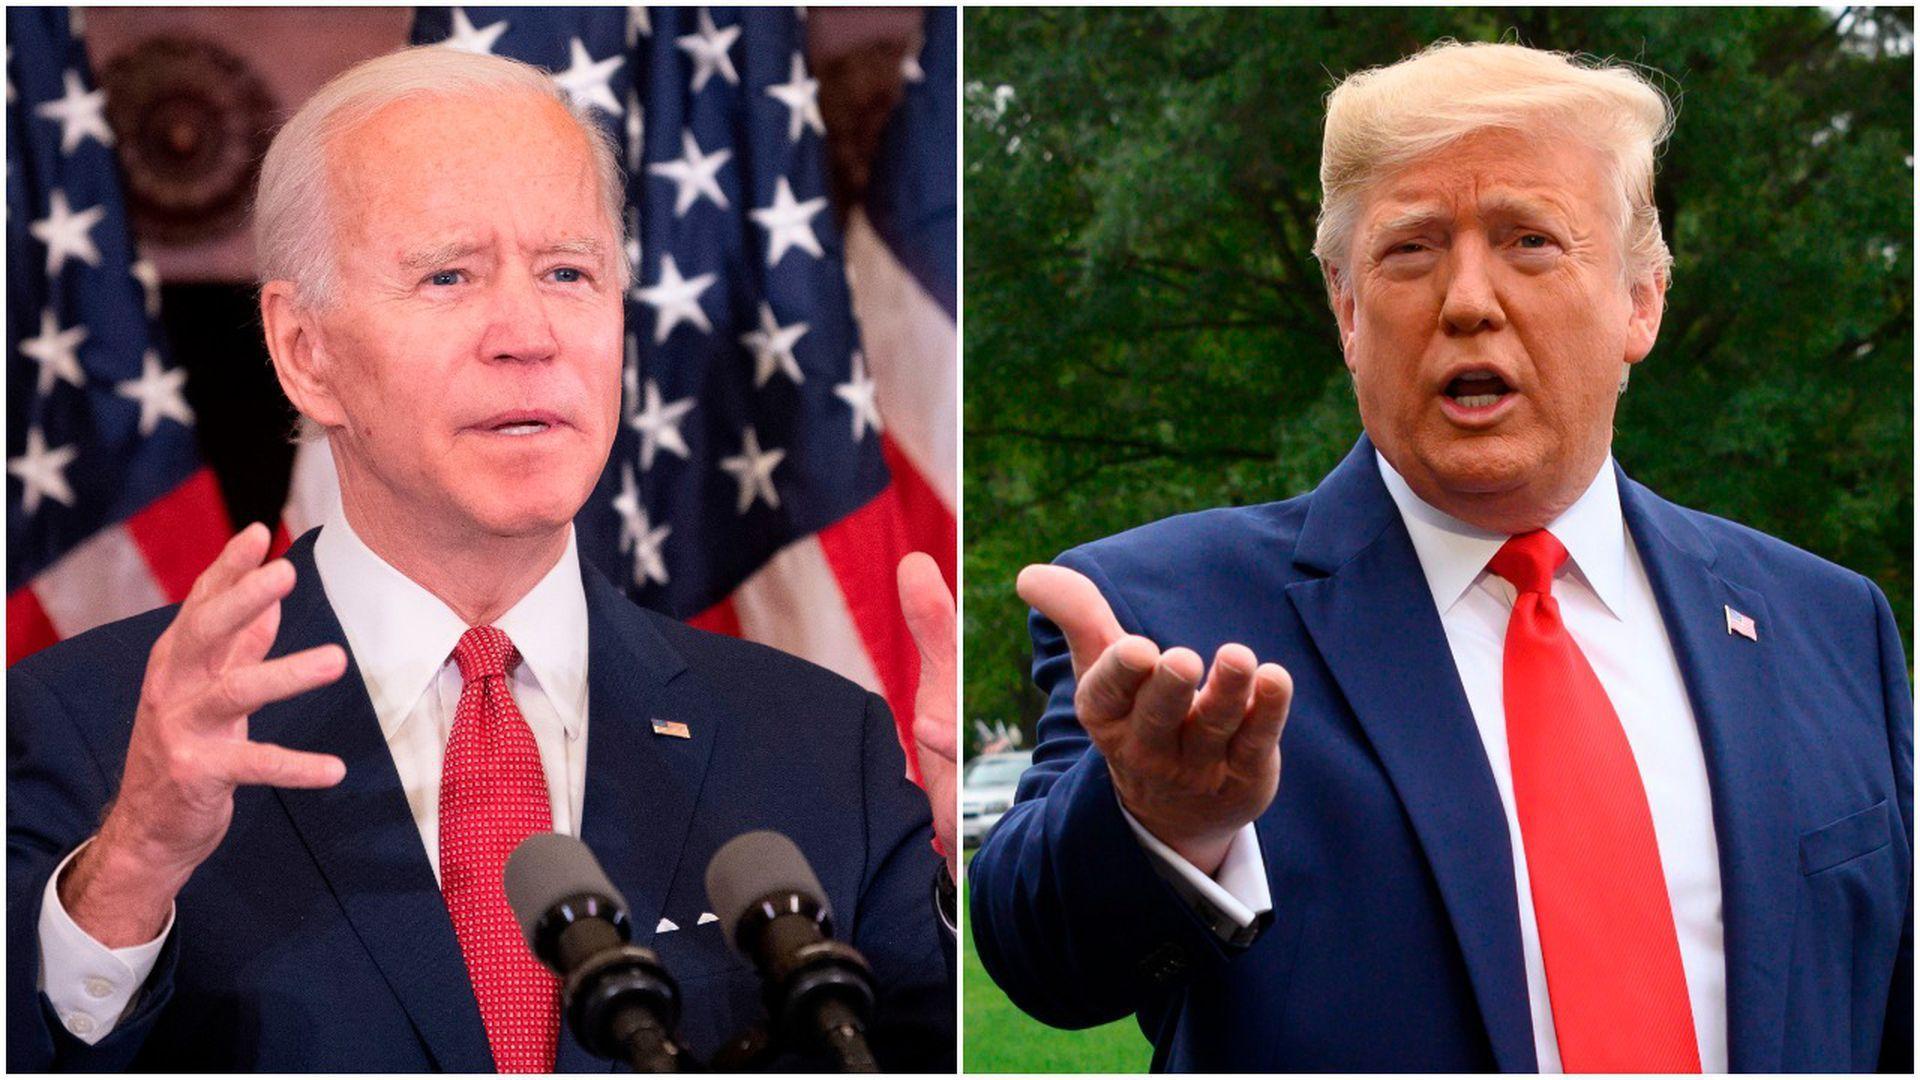 Trump vs. Biden: Senility becomes 2020 flashpoint - Axios